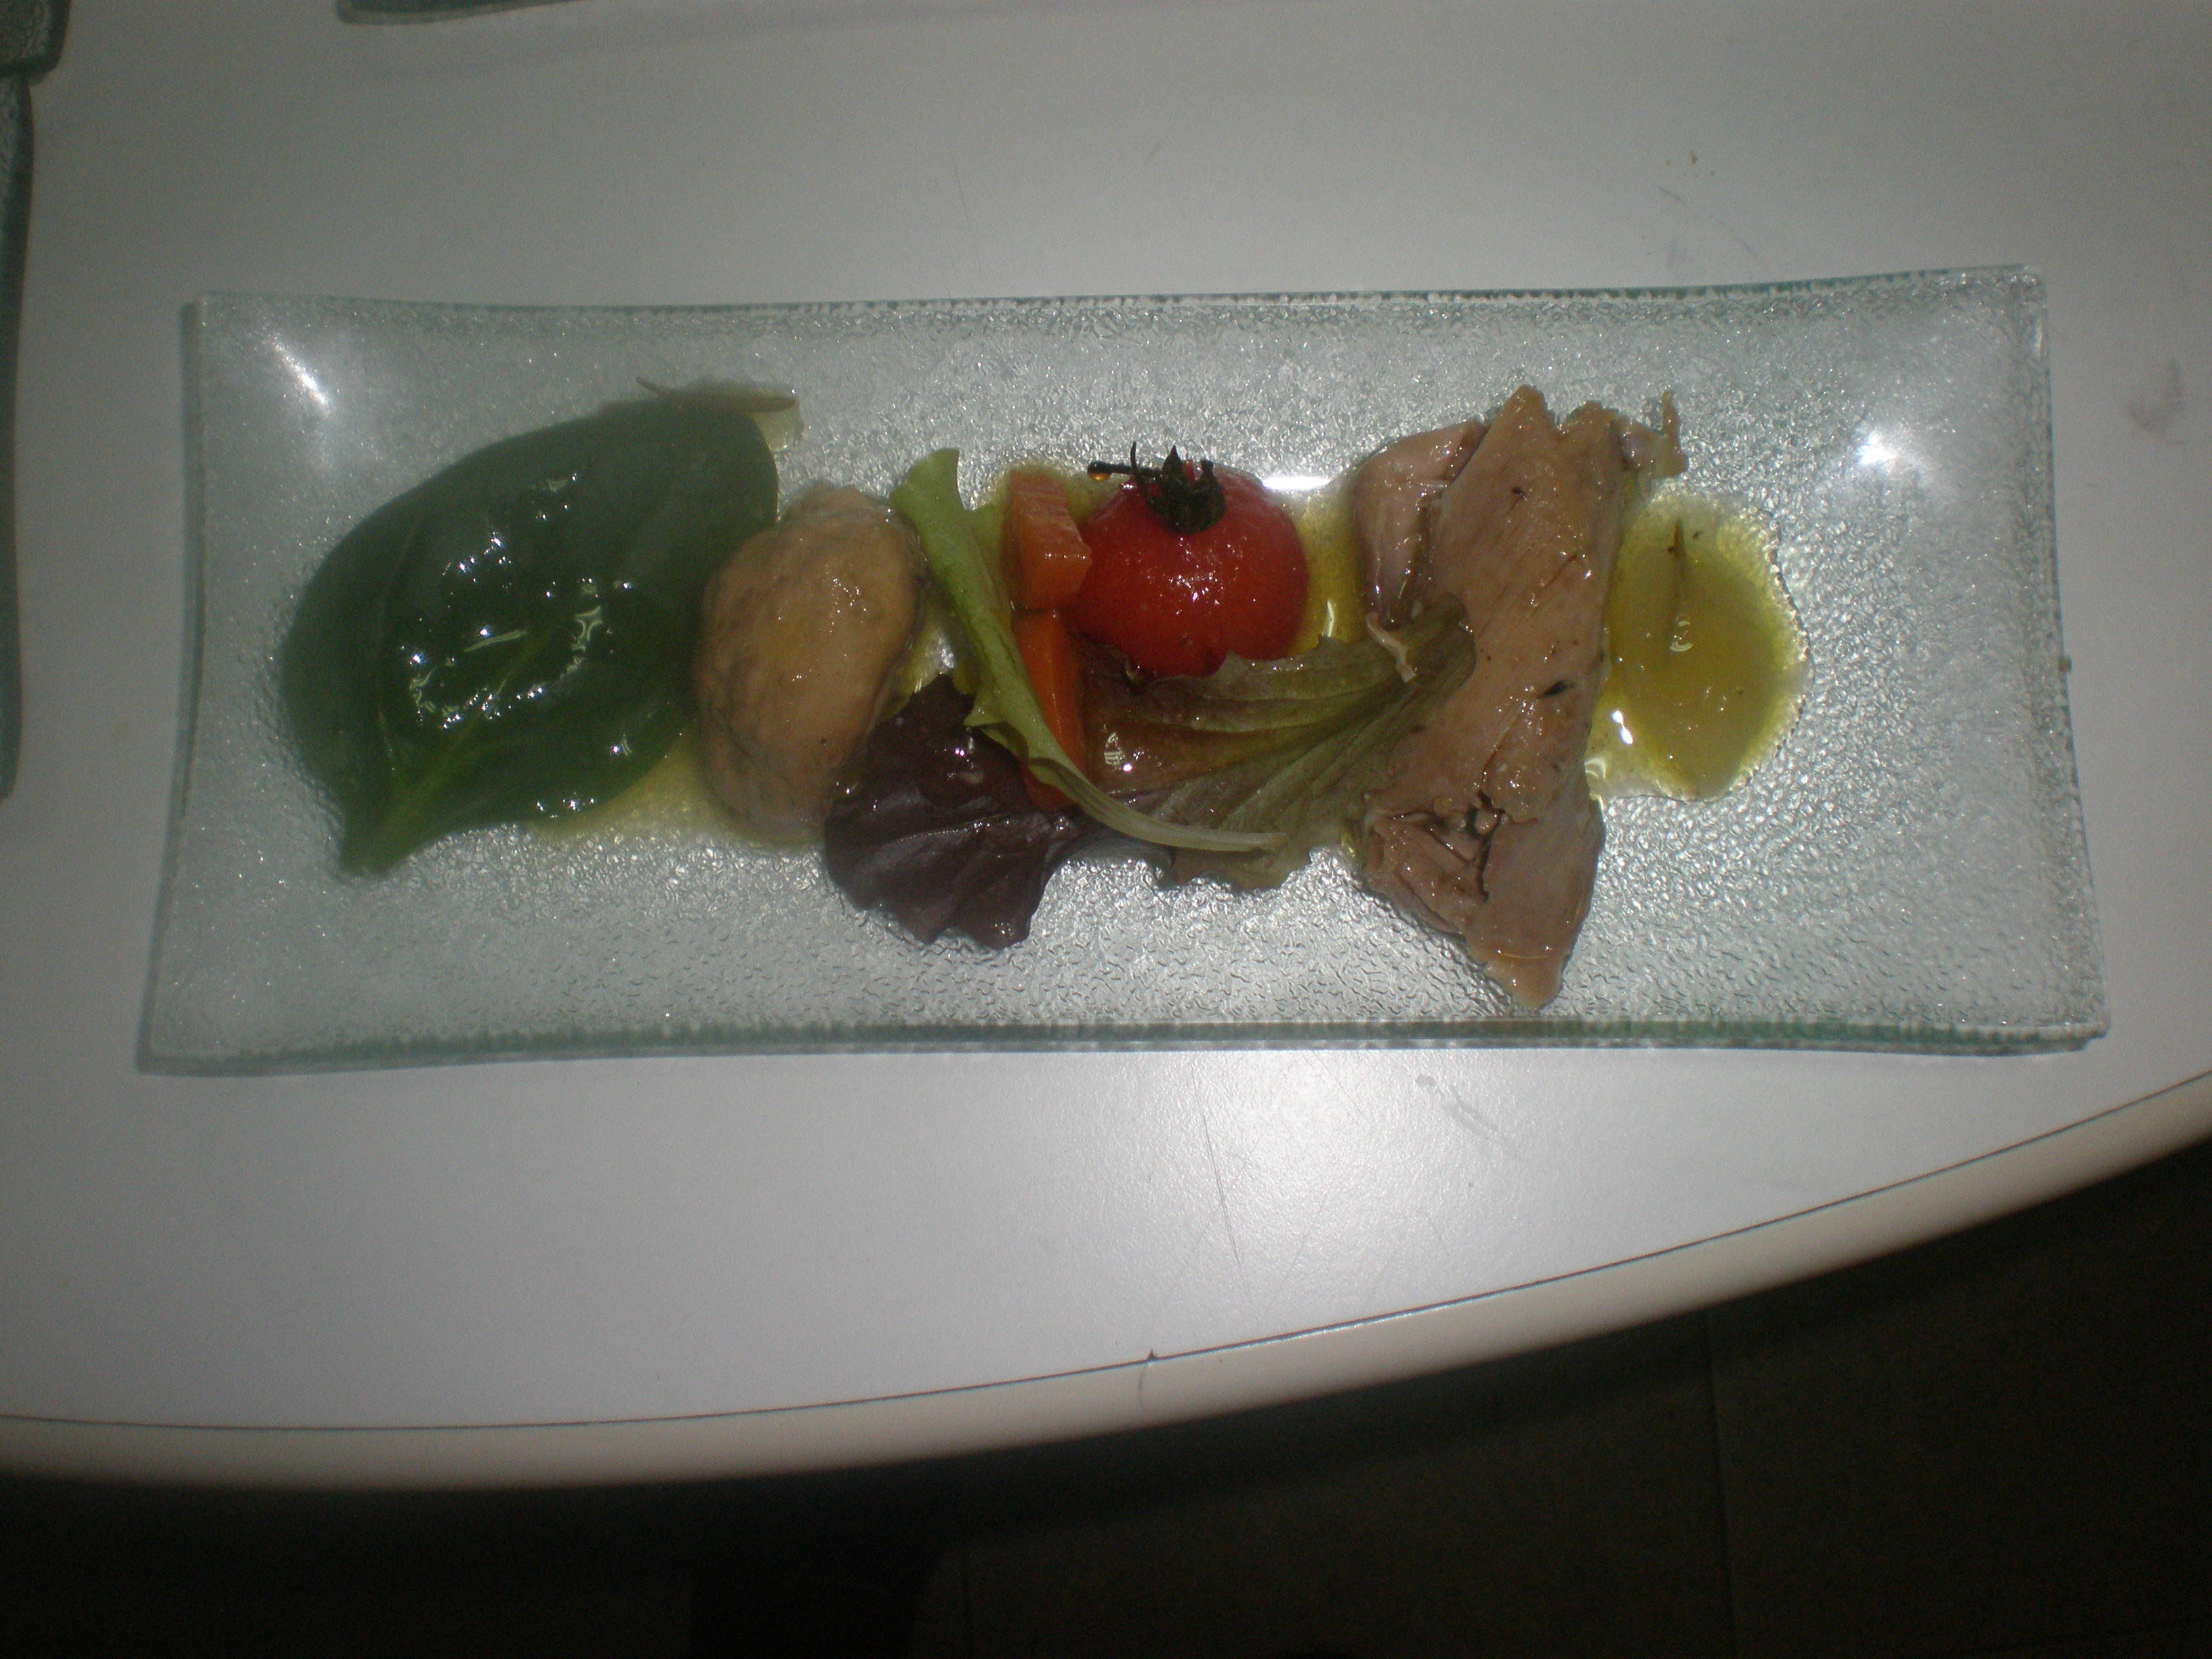 Ensalada de perdiz escabechada con tomates cherry confitados